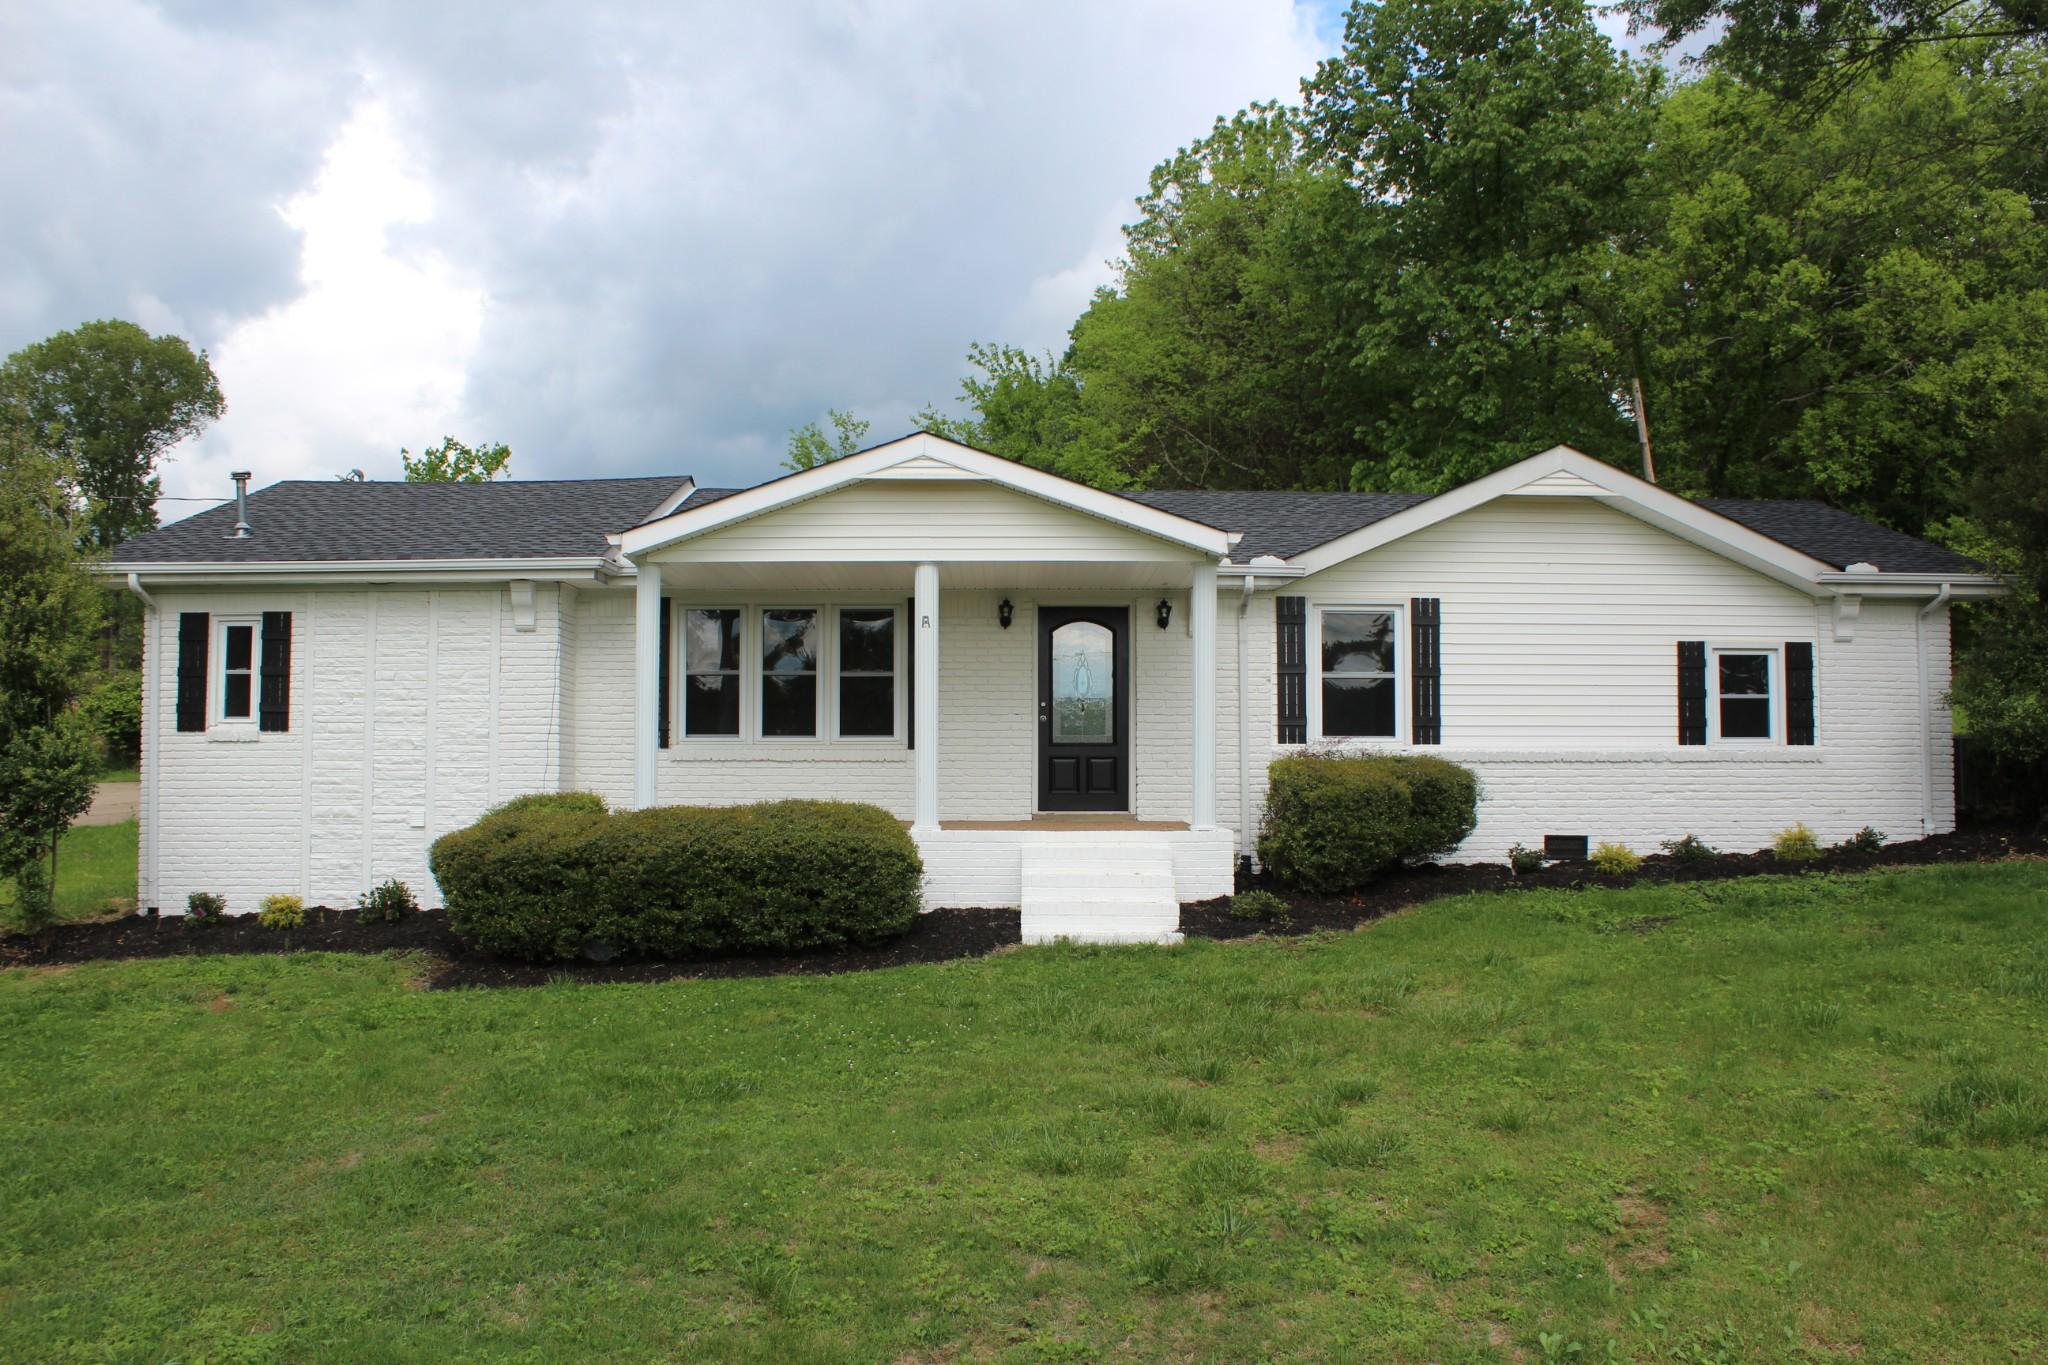 744 Driver Cir Property Photo - Hartsville, TN real estate listing